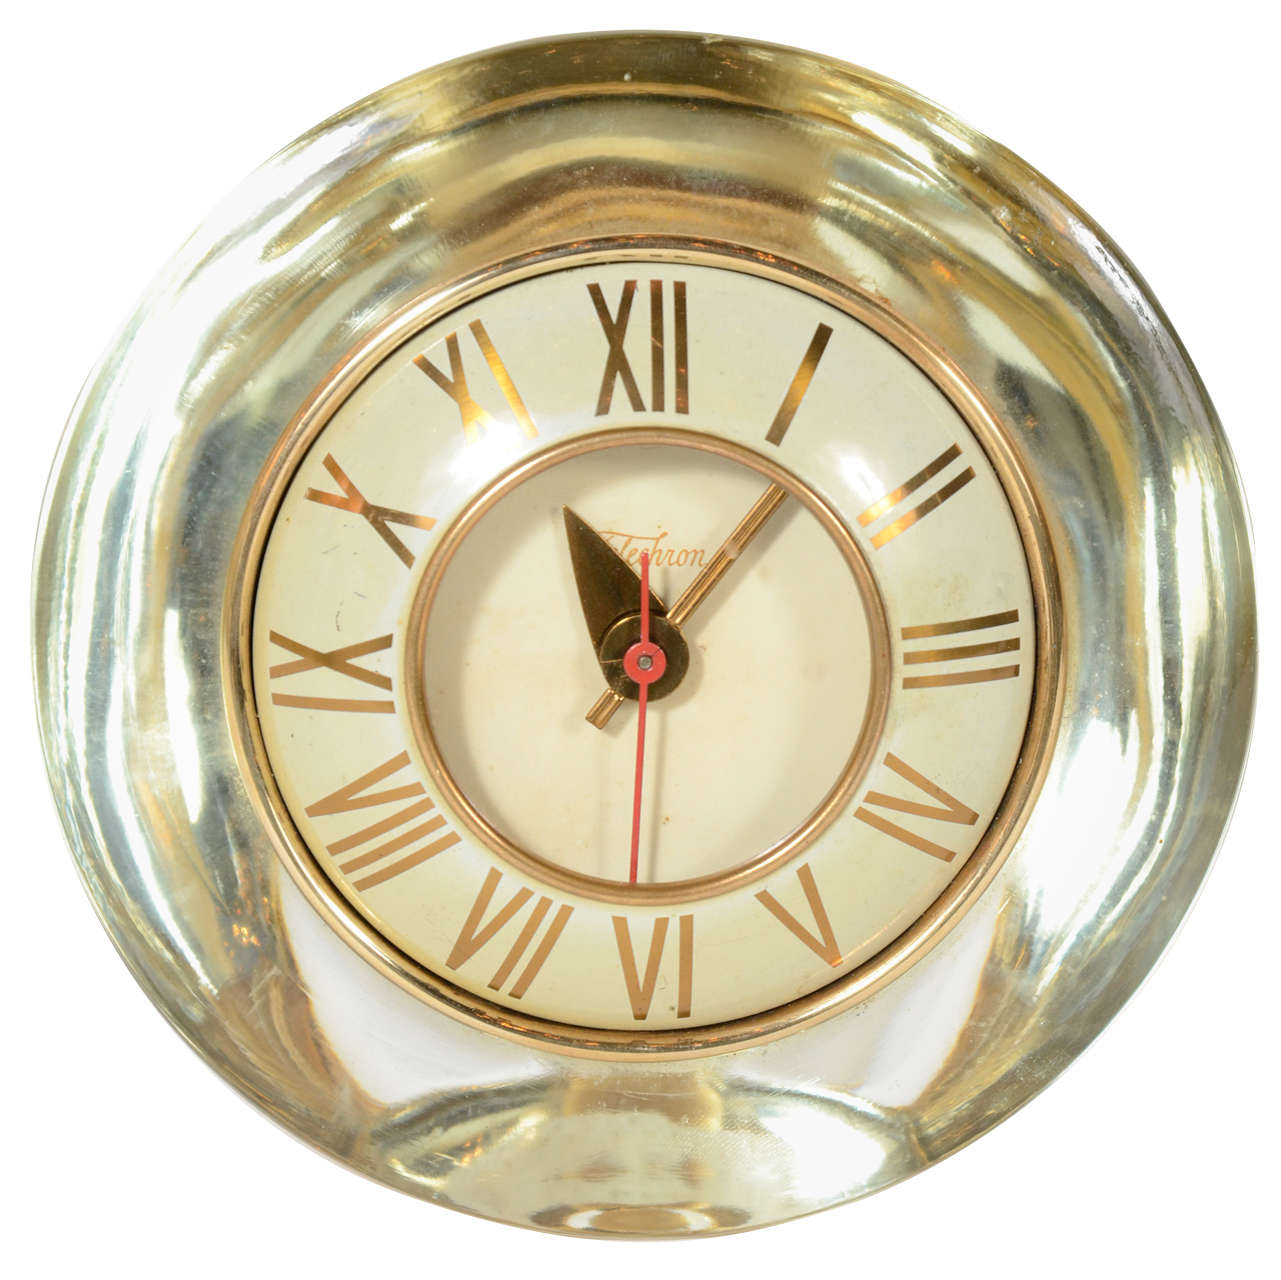 Modernist Gold Mercury Glass Clock by Telechron at 1stdibs